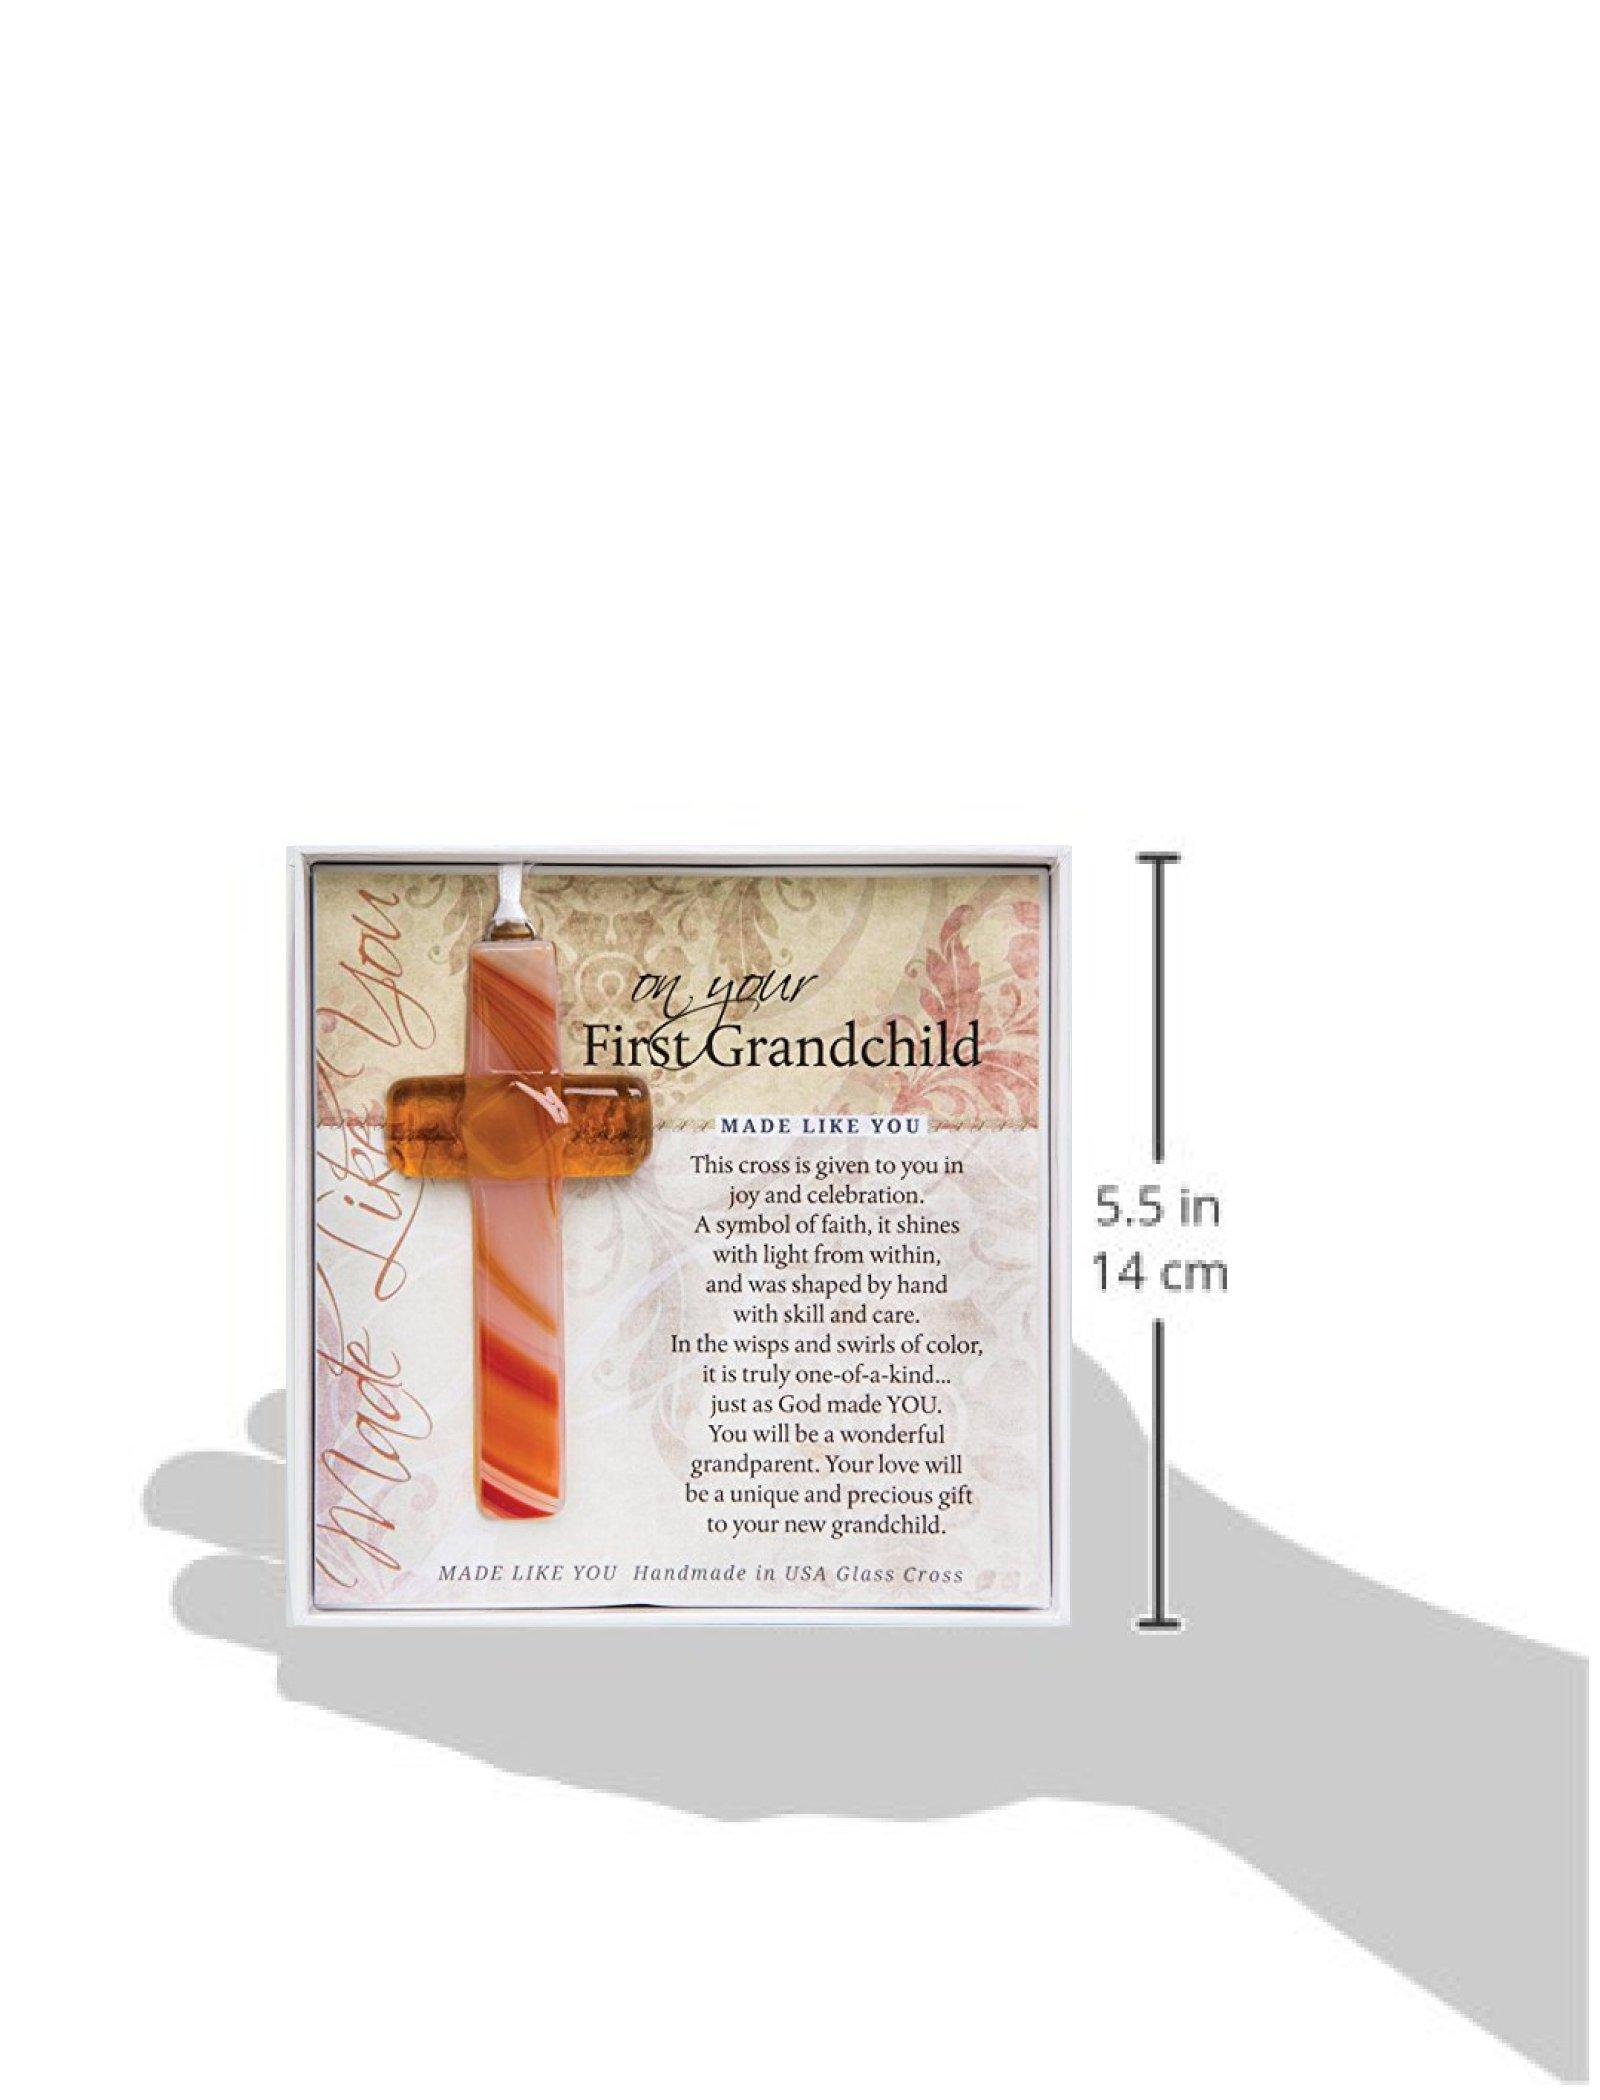 On Your First Grandchild Keepsake Glass Cross Gift for New Grandparents